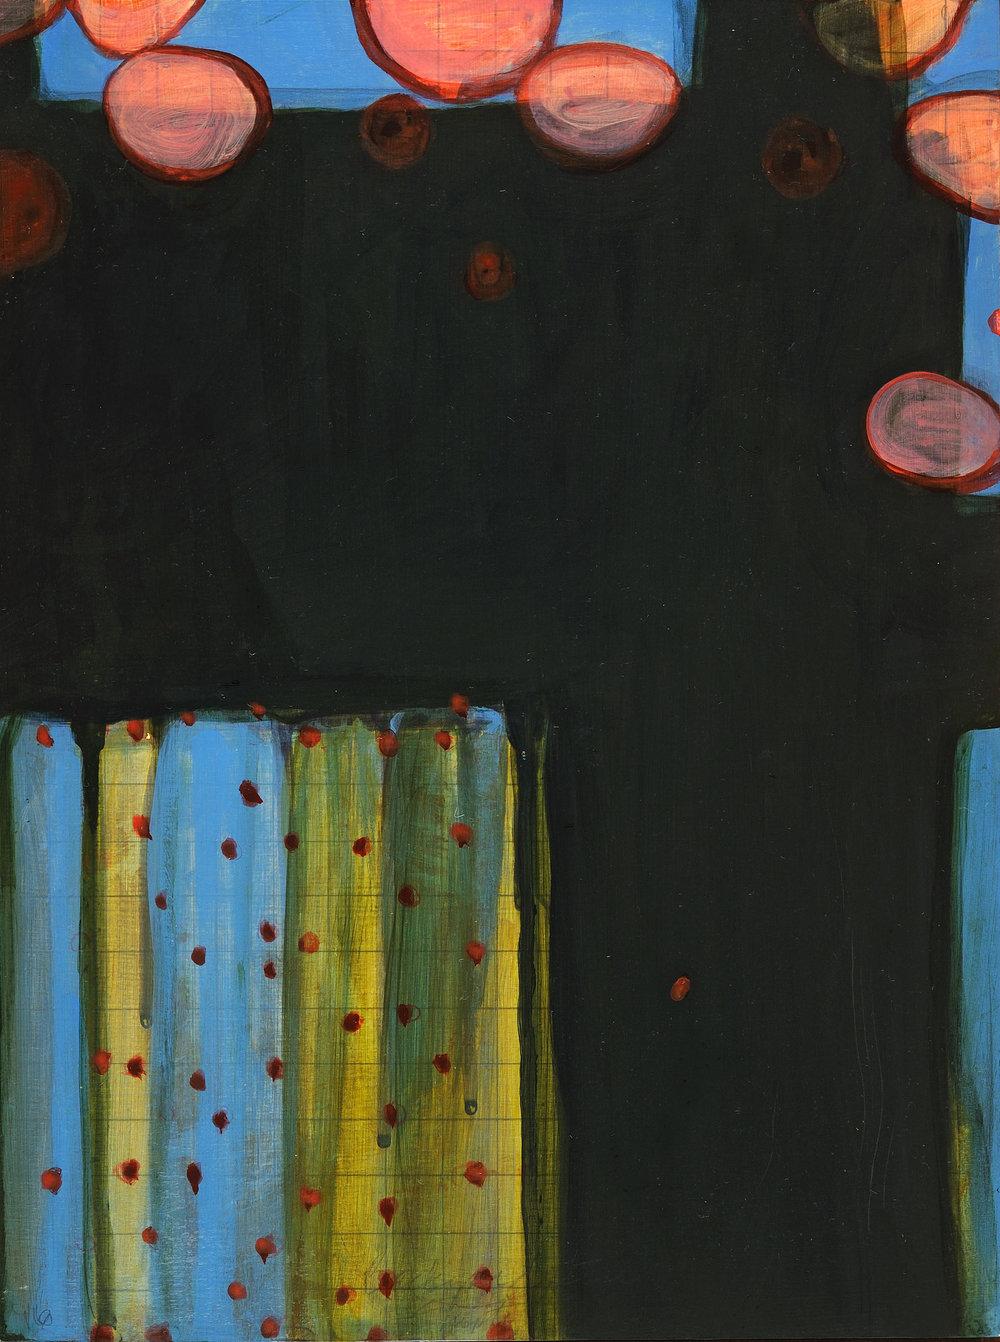 """Backyard Study: Empty Garden"" 9X12, acrylic, graphite on wood, 2016 SOLD"